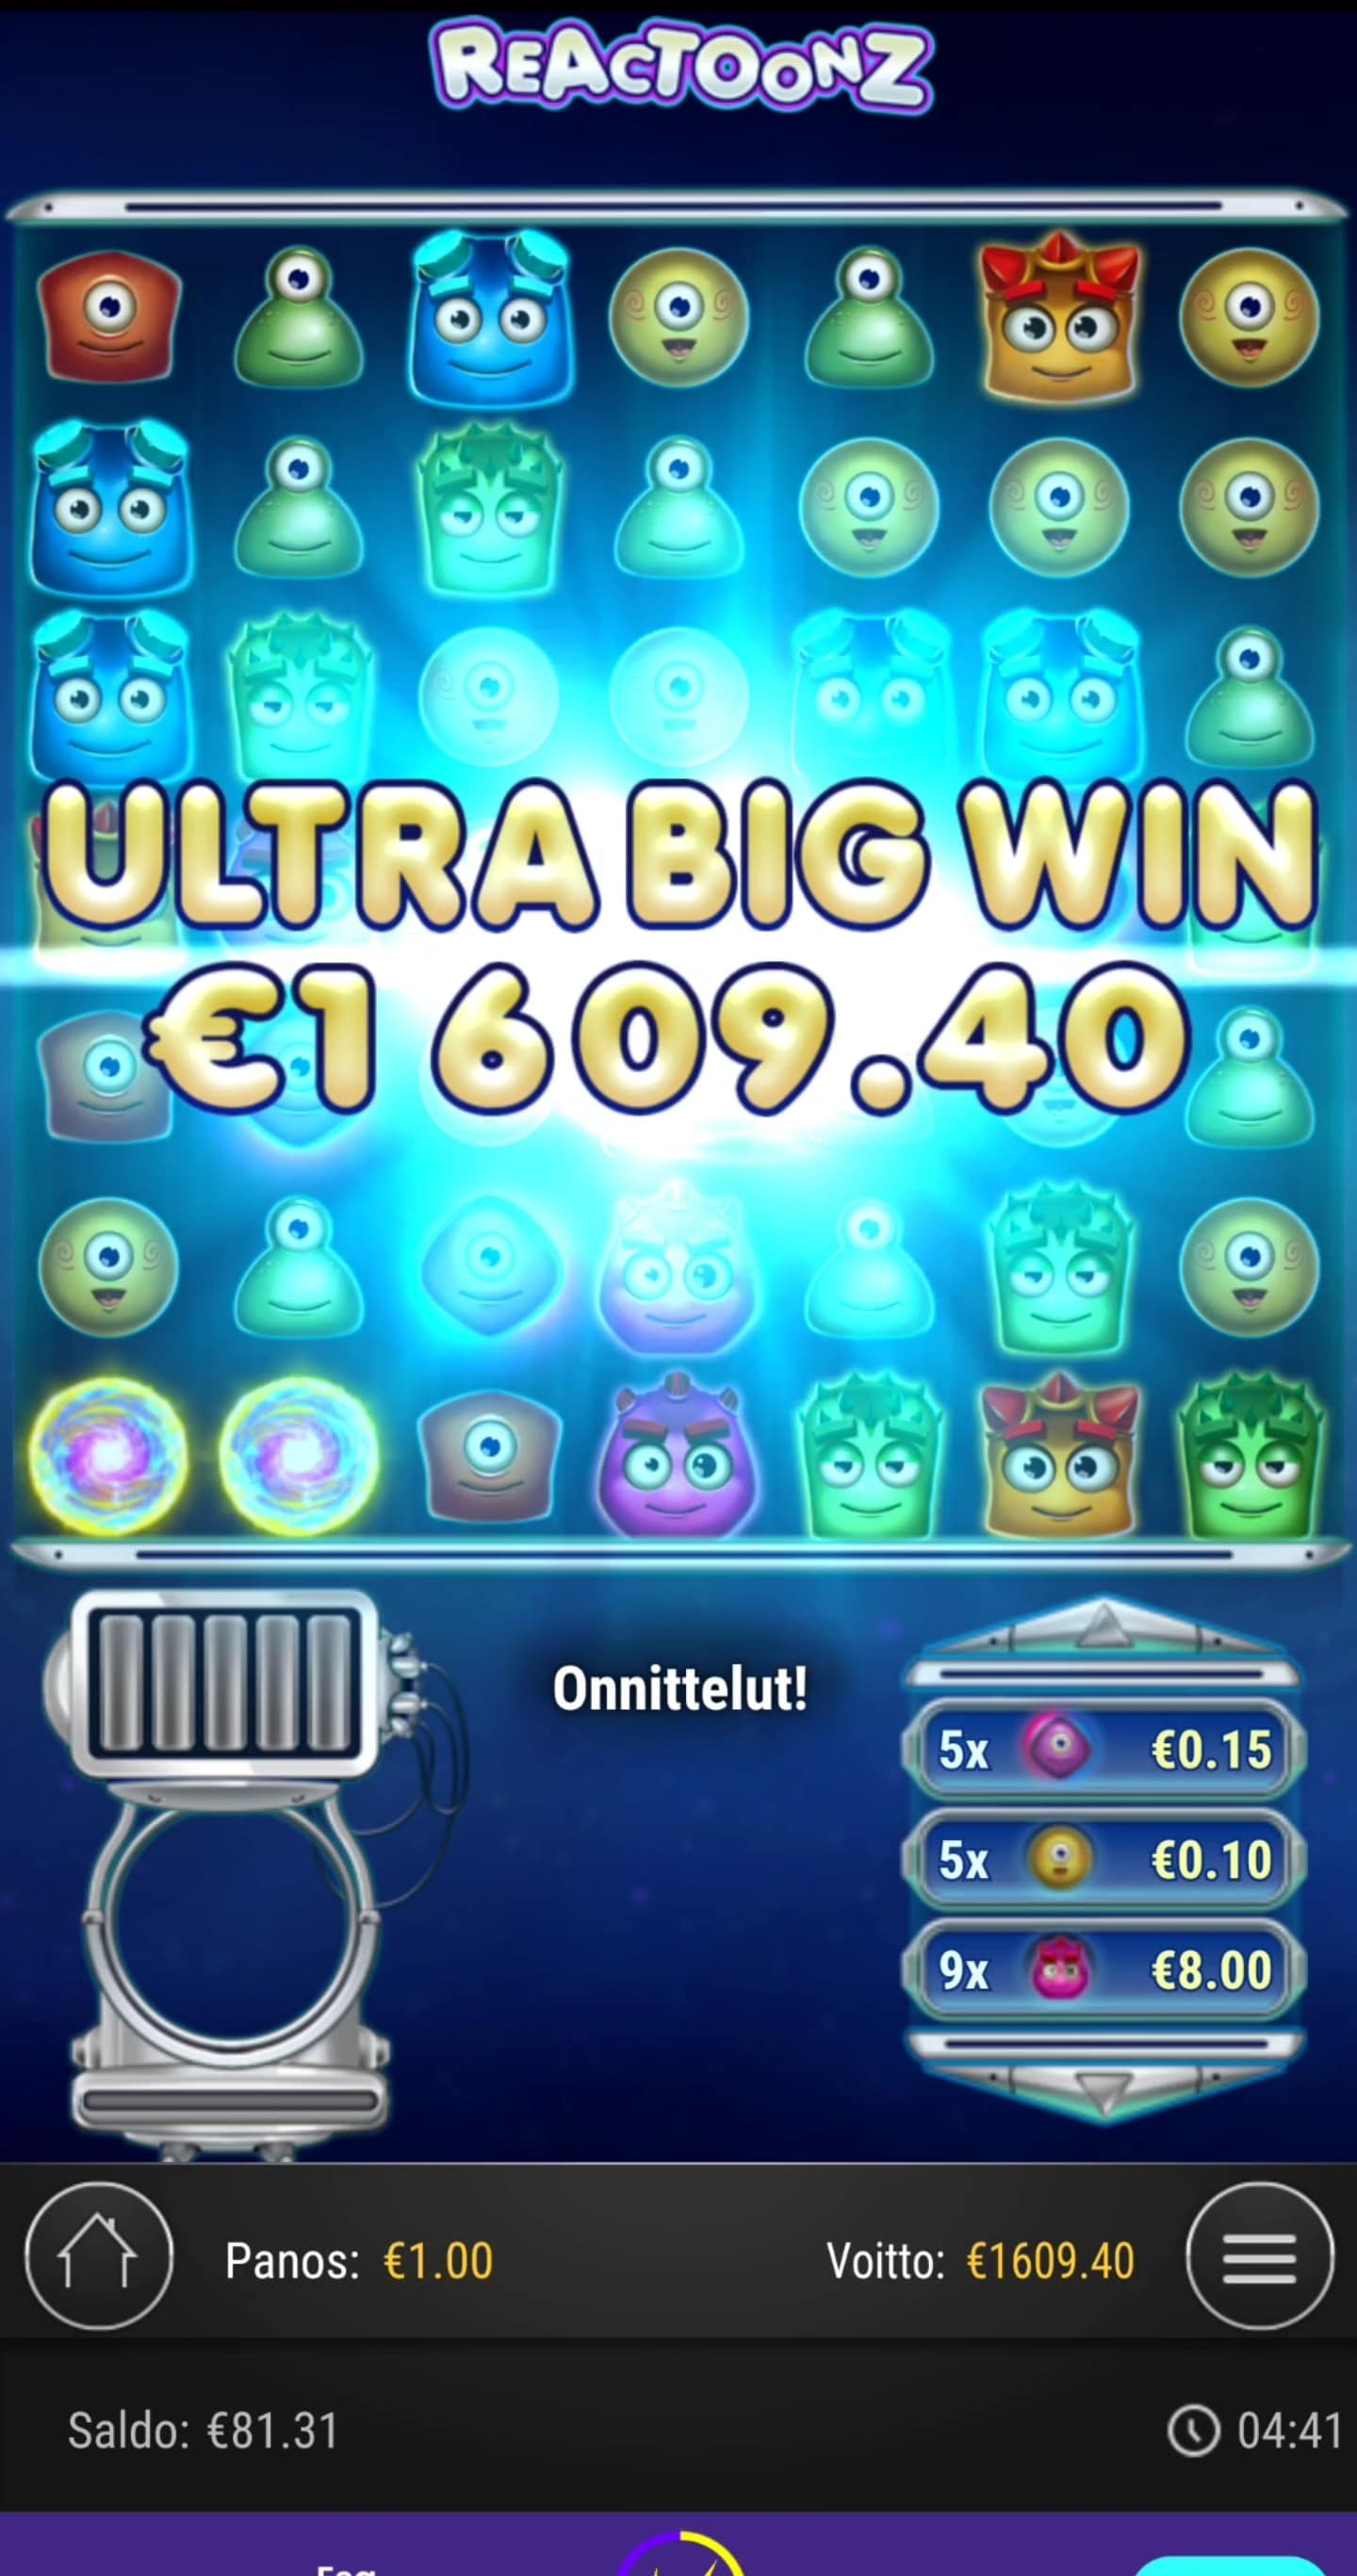 Reactoonz Casino win picture by Salatheel 1.1.2021 1609.40e 1609X Wildz